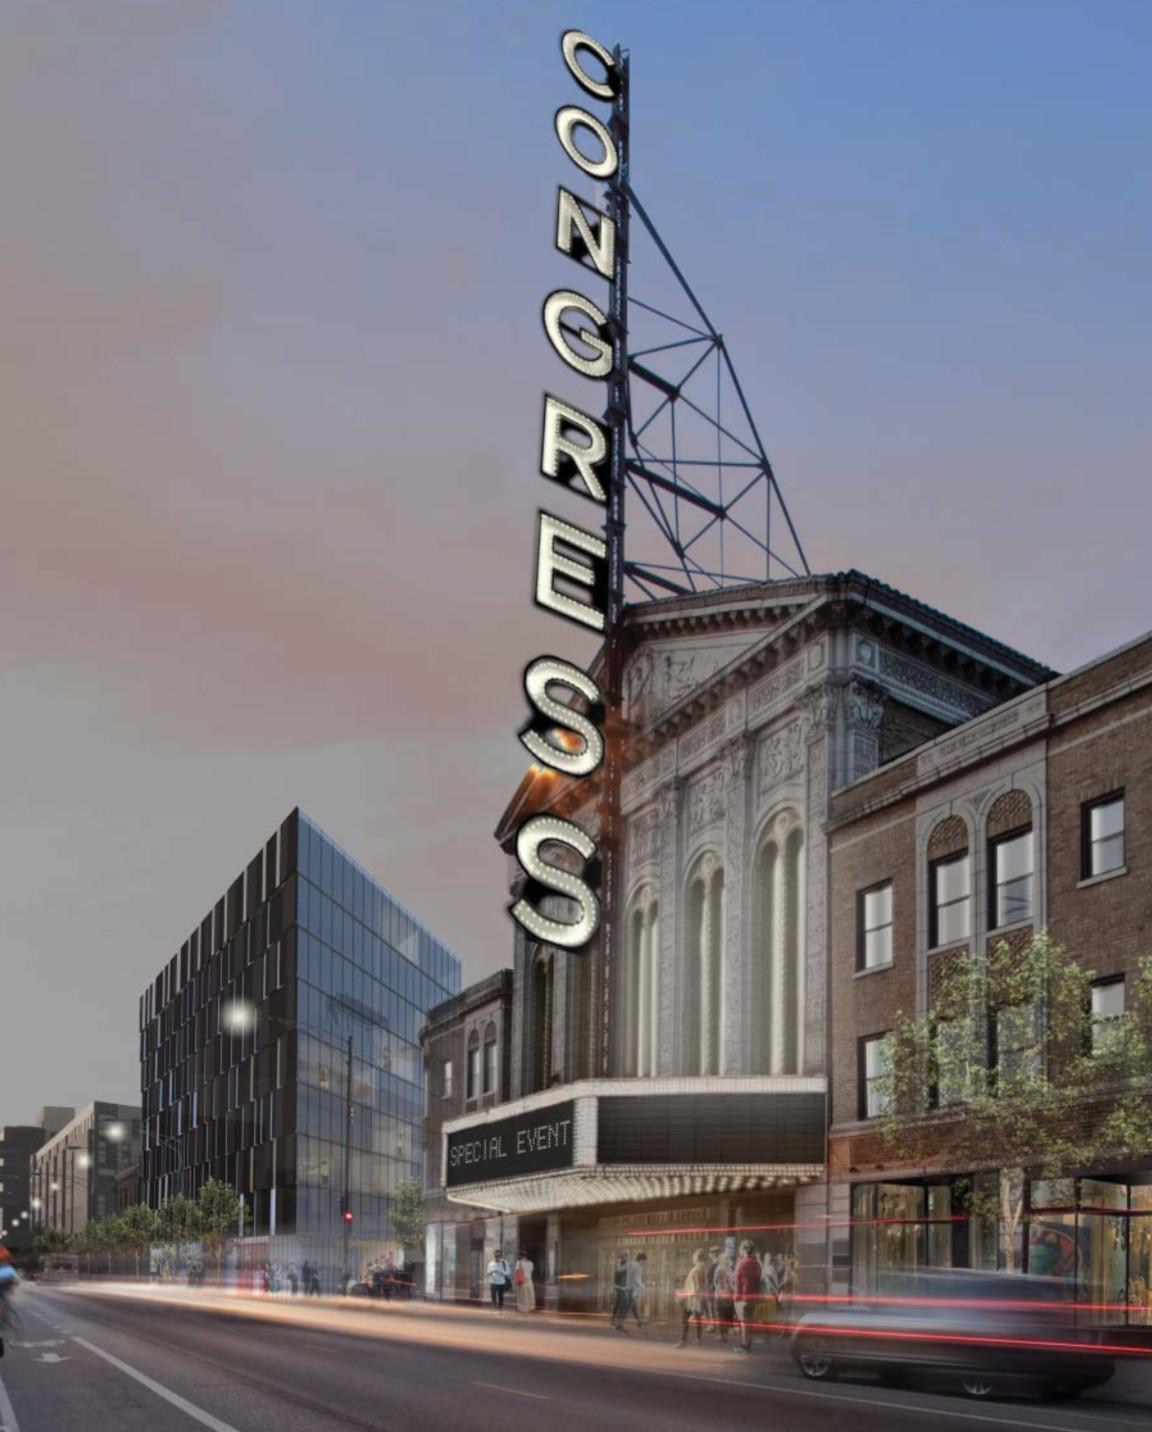 Best Apartment Finder Chicago: Congress Theater Developer Planning More Than 100